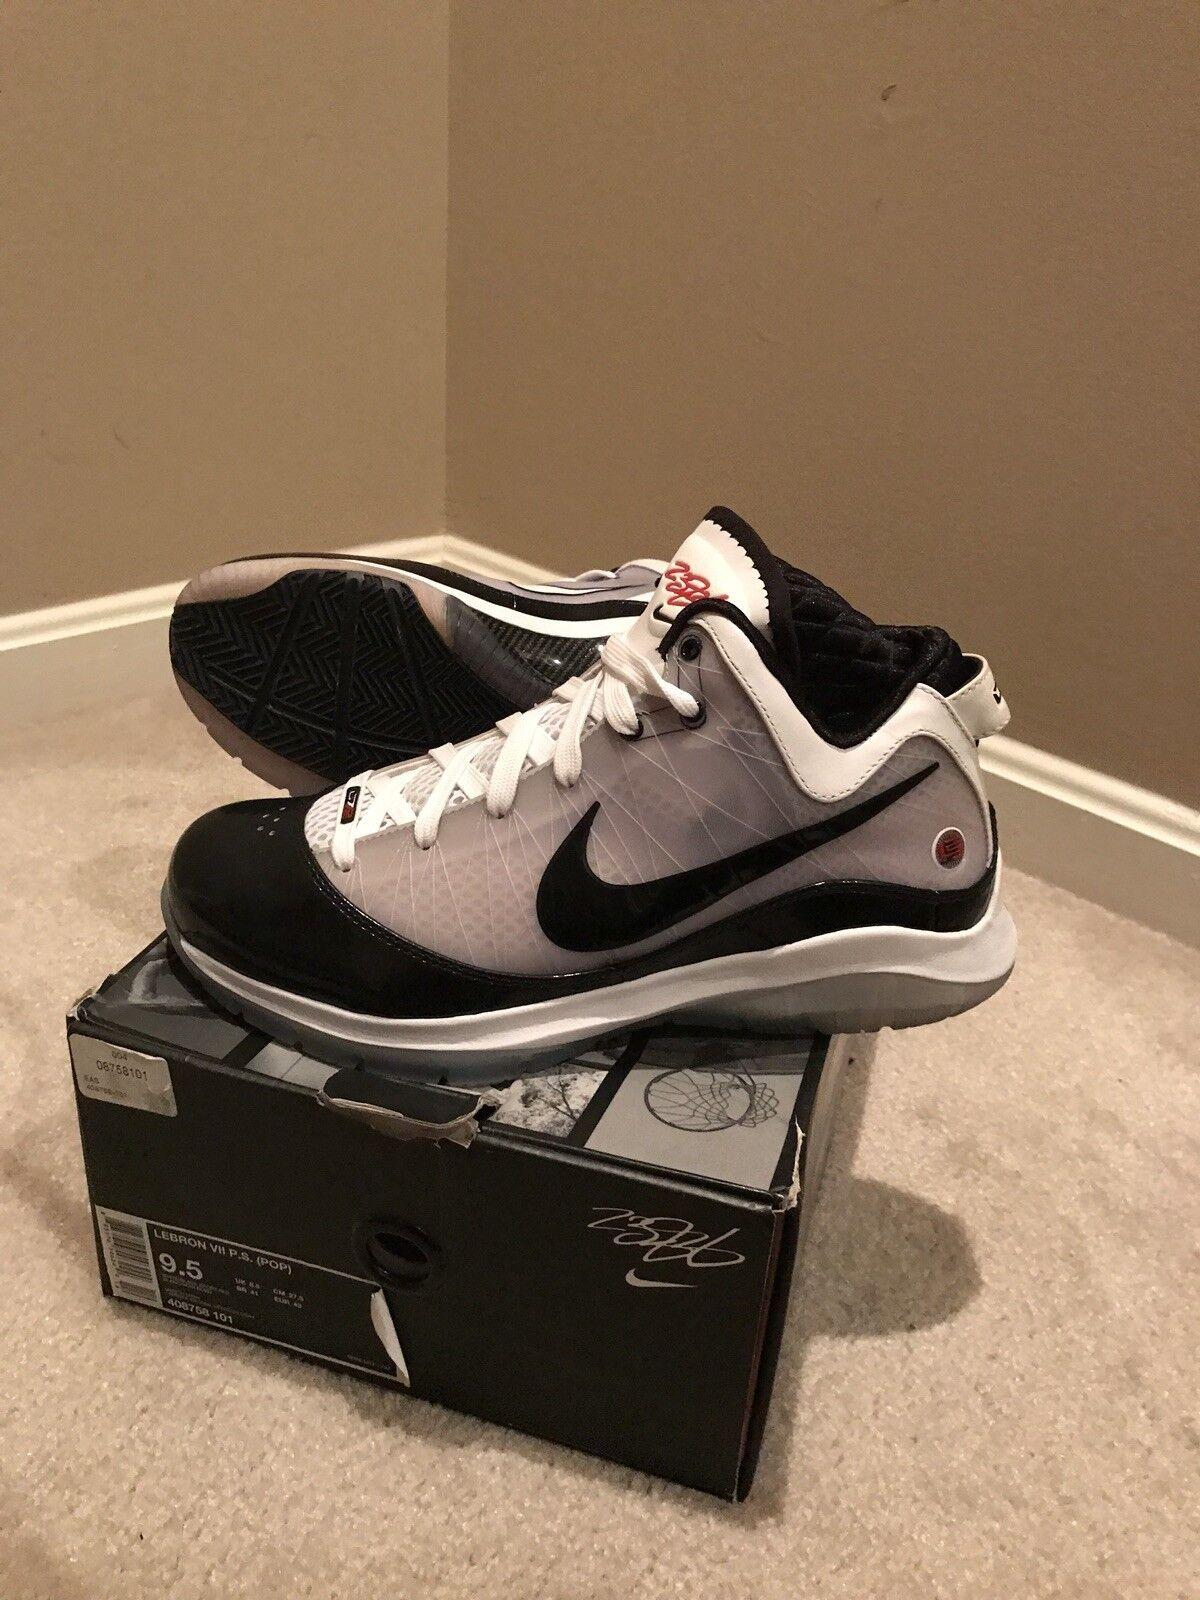 Nike Lebron 7 9.5 vii elite playoffs 9 China Miami Heat championship pack 16 9 playoffs x 1 301b31